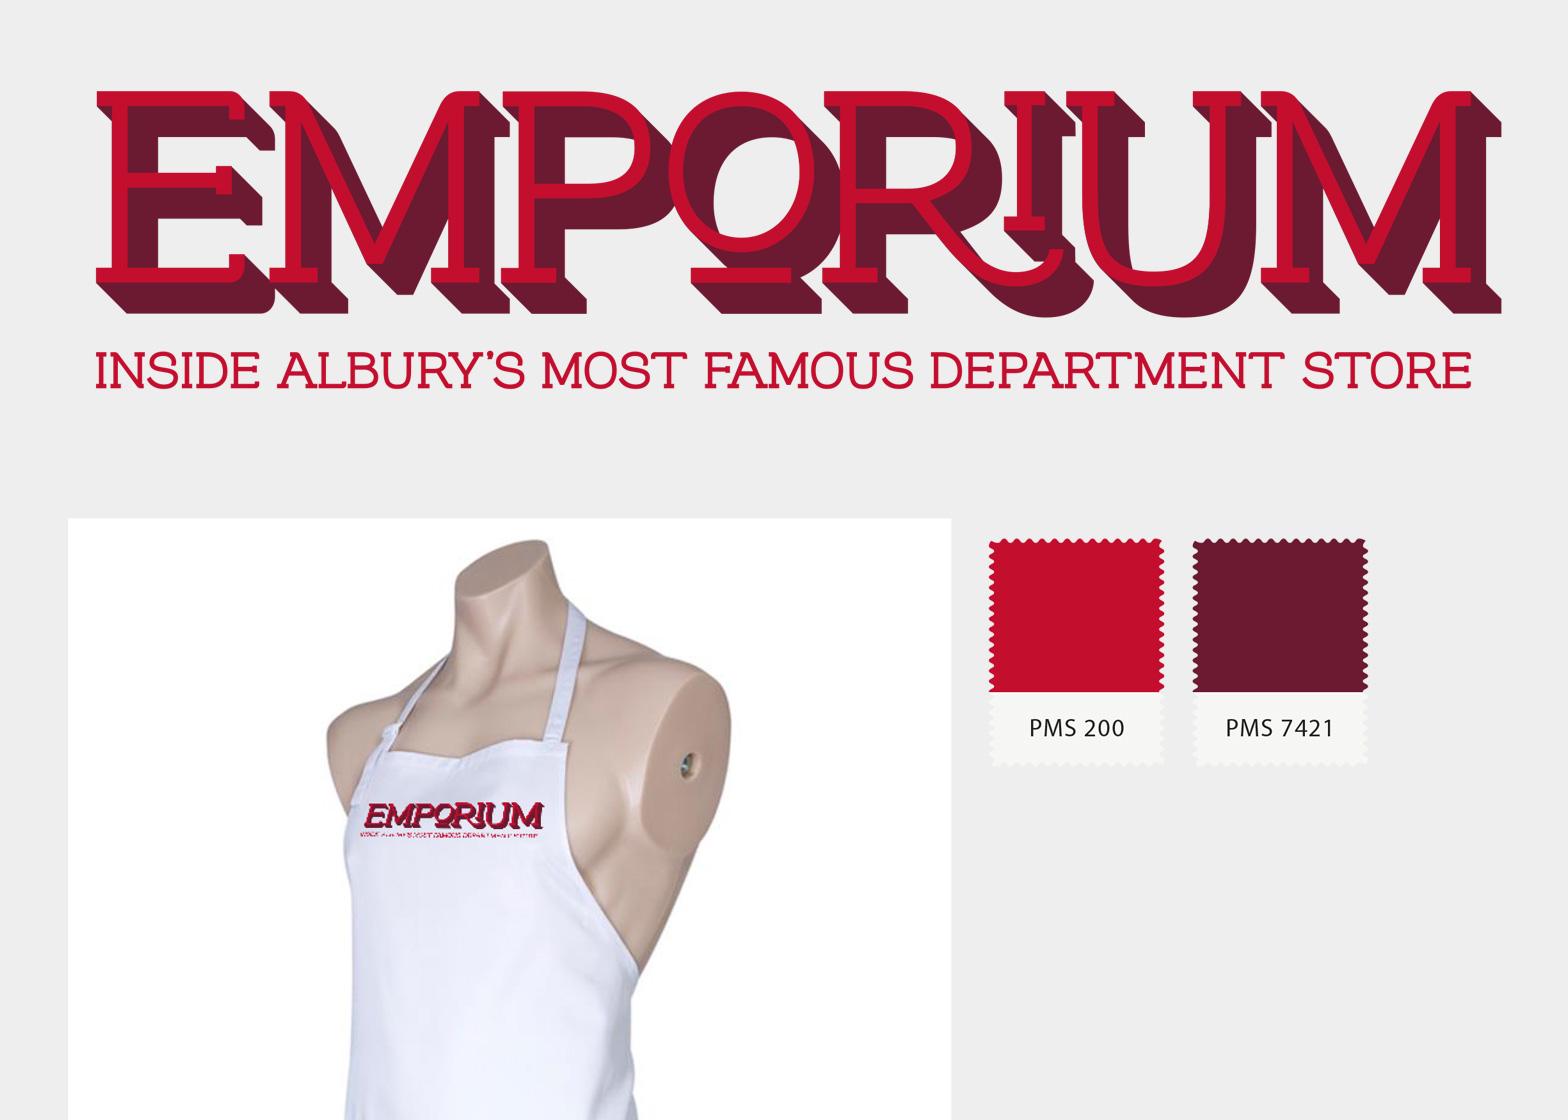 Emporium-Abikhair-Merchandise - Wmedia